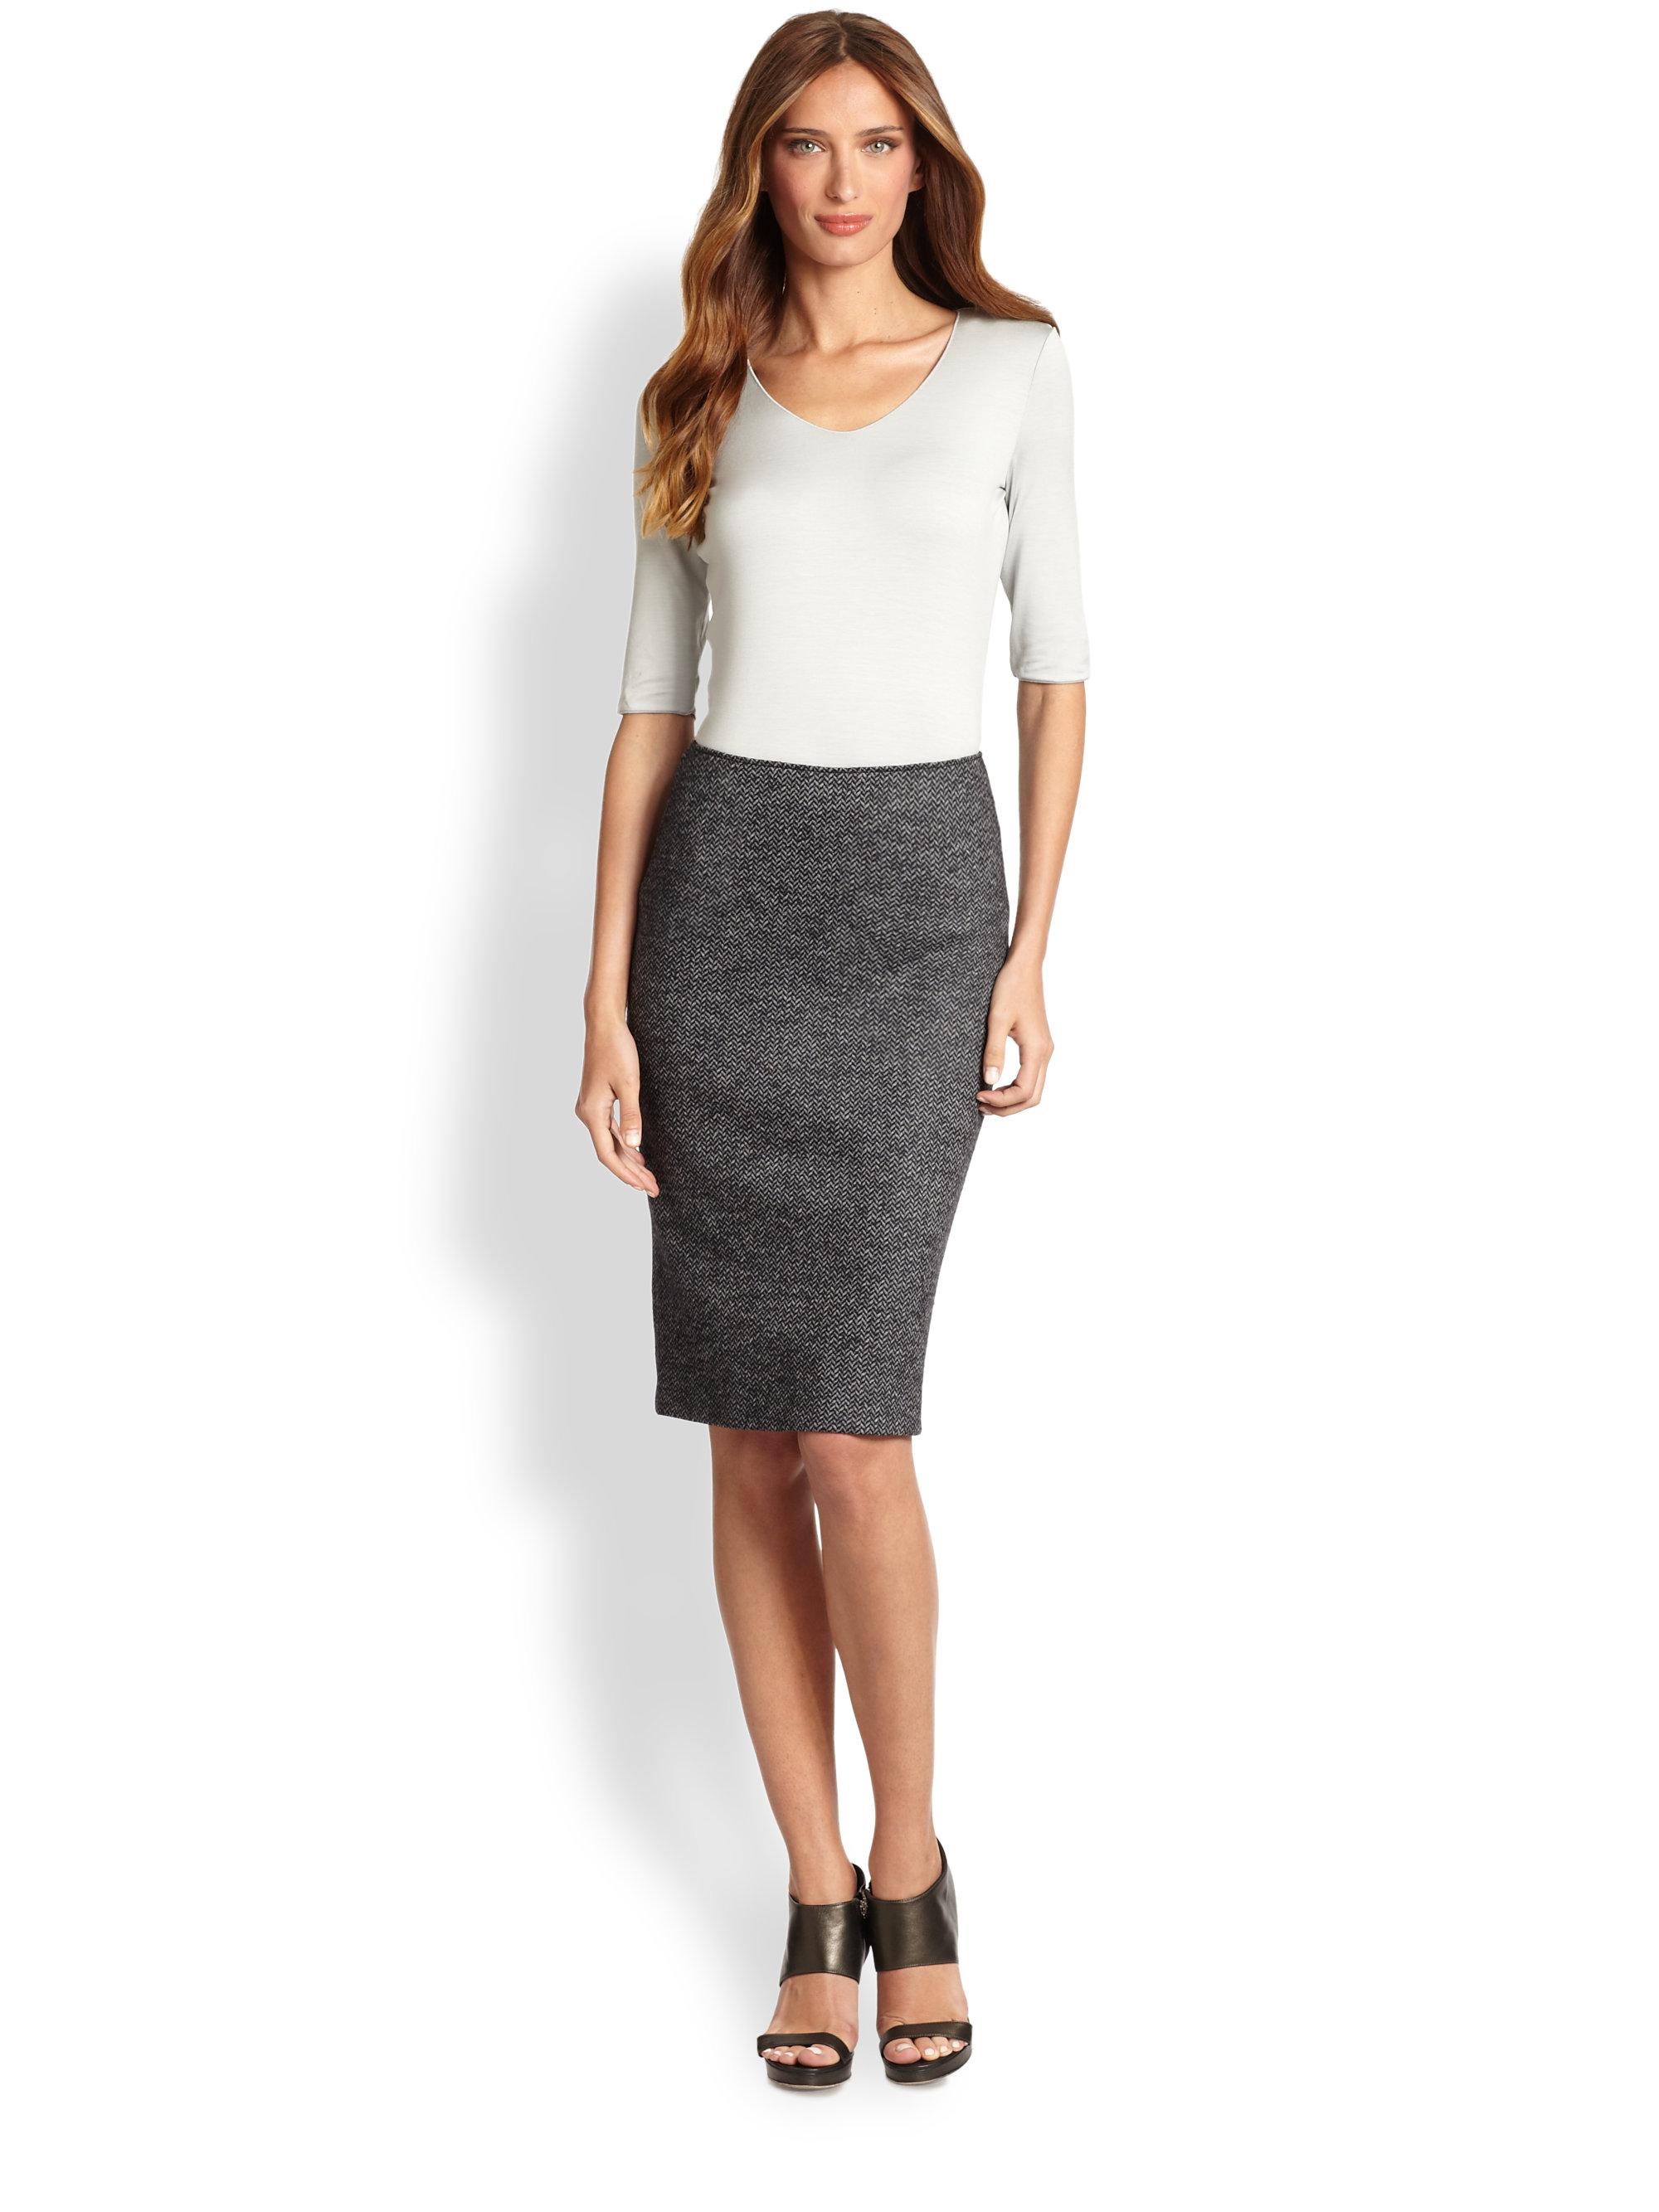 Armani Herringbone Jersey Pencil Skirt in Gray | Lyst